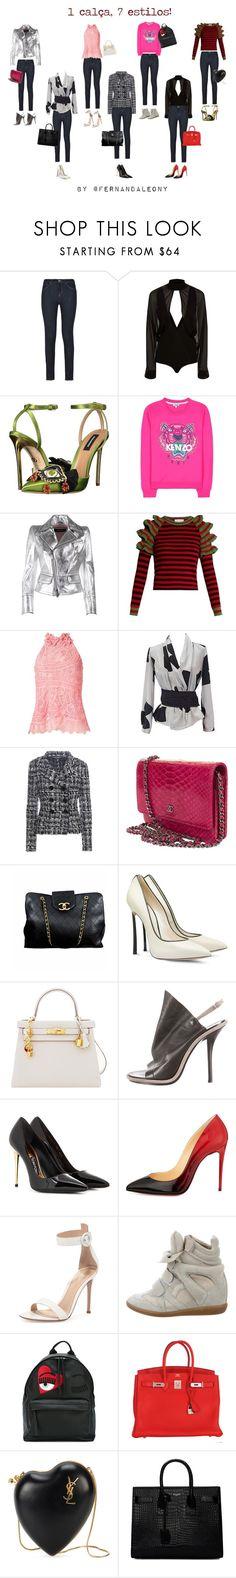 """7 styles"" by fleony on Polyvore featuring moda, Armani Jeans, Balmain, Dsquared2, Kenzo, Gucci, Martha Medeiros, Emporio Armani, Dolce&Gabbana e Chanel"